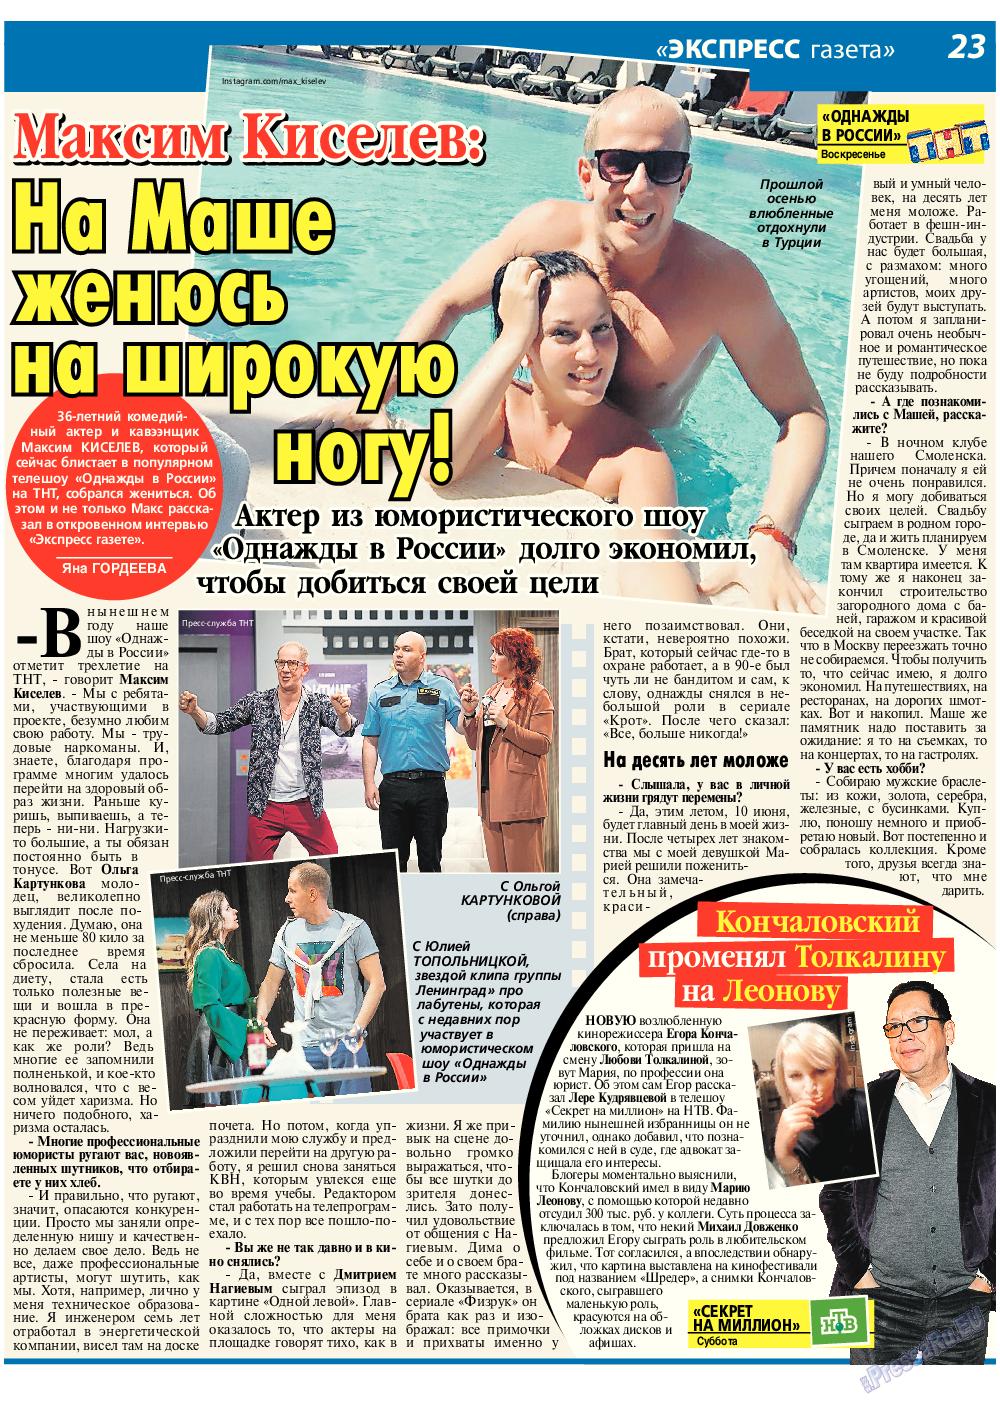 Экспресс газета (газета). 2017 год, номер 5, стр. 23